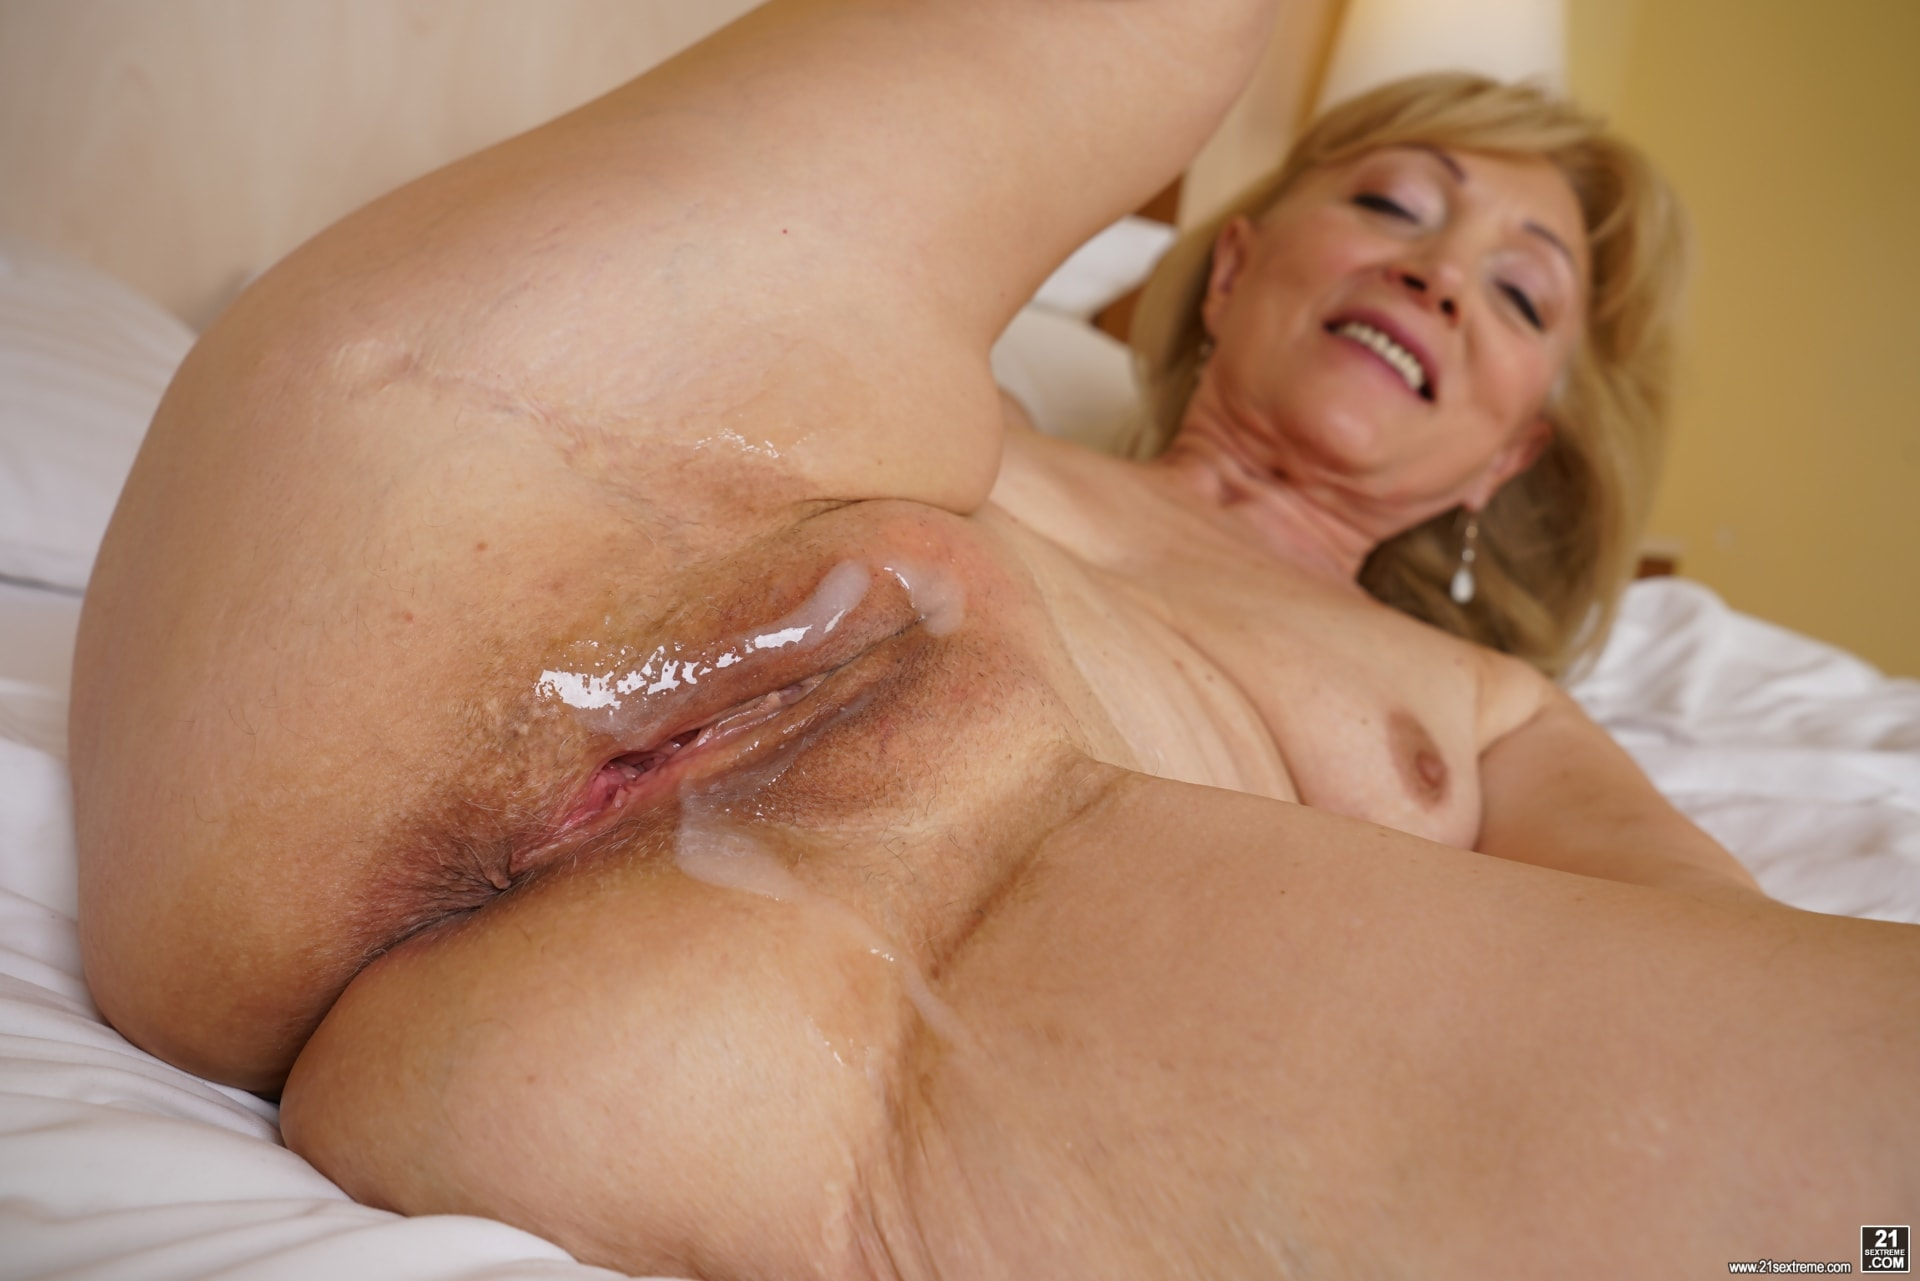 21Sextury 'Lusty Szuzanne's Naughty Fun' starring Szuzanne (Photo 180)